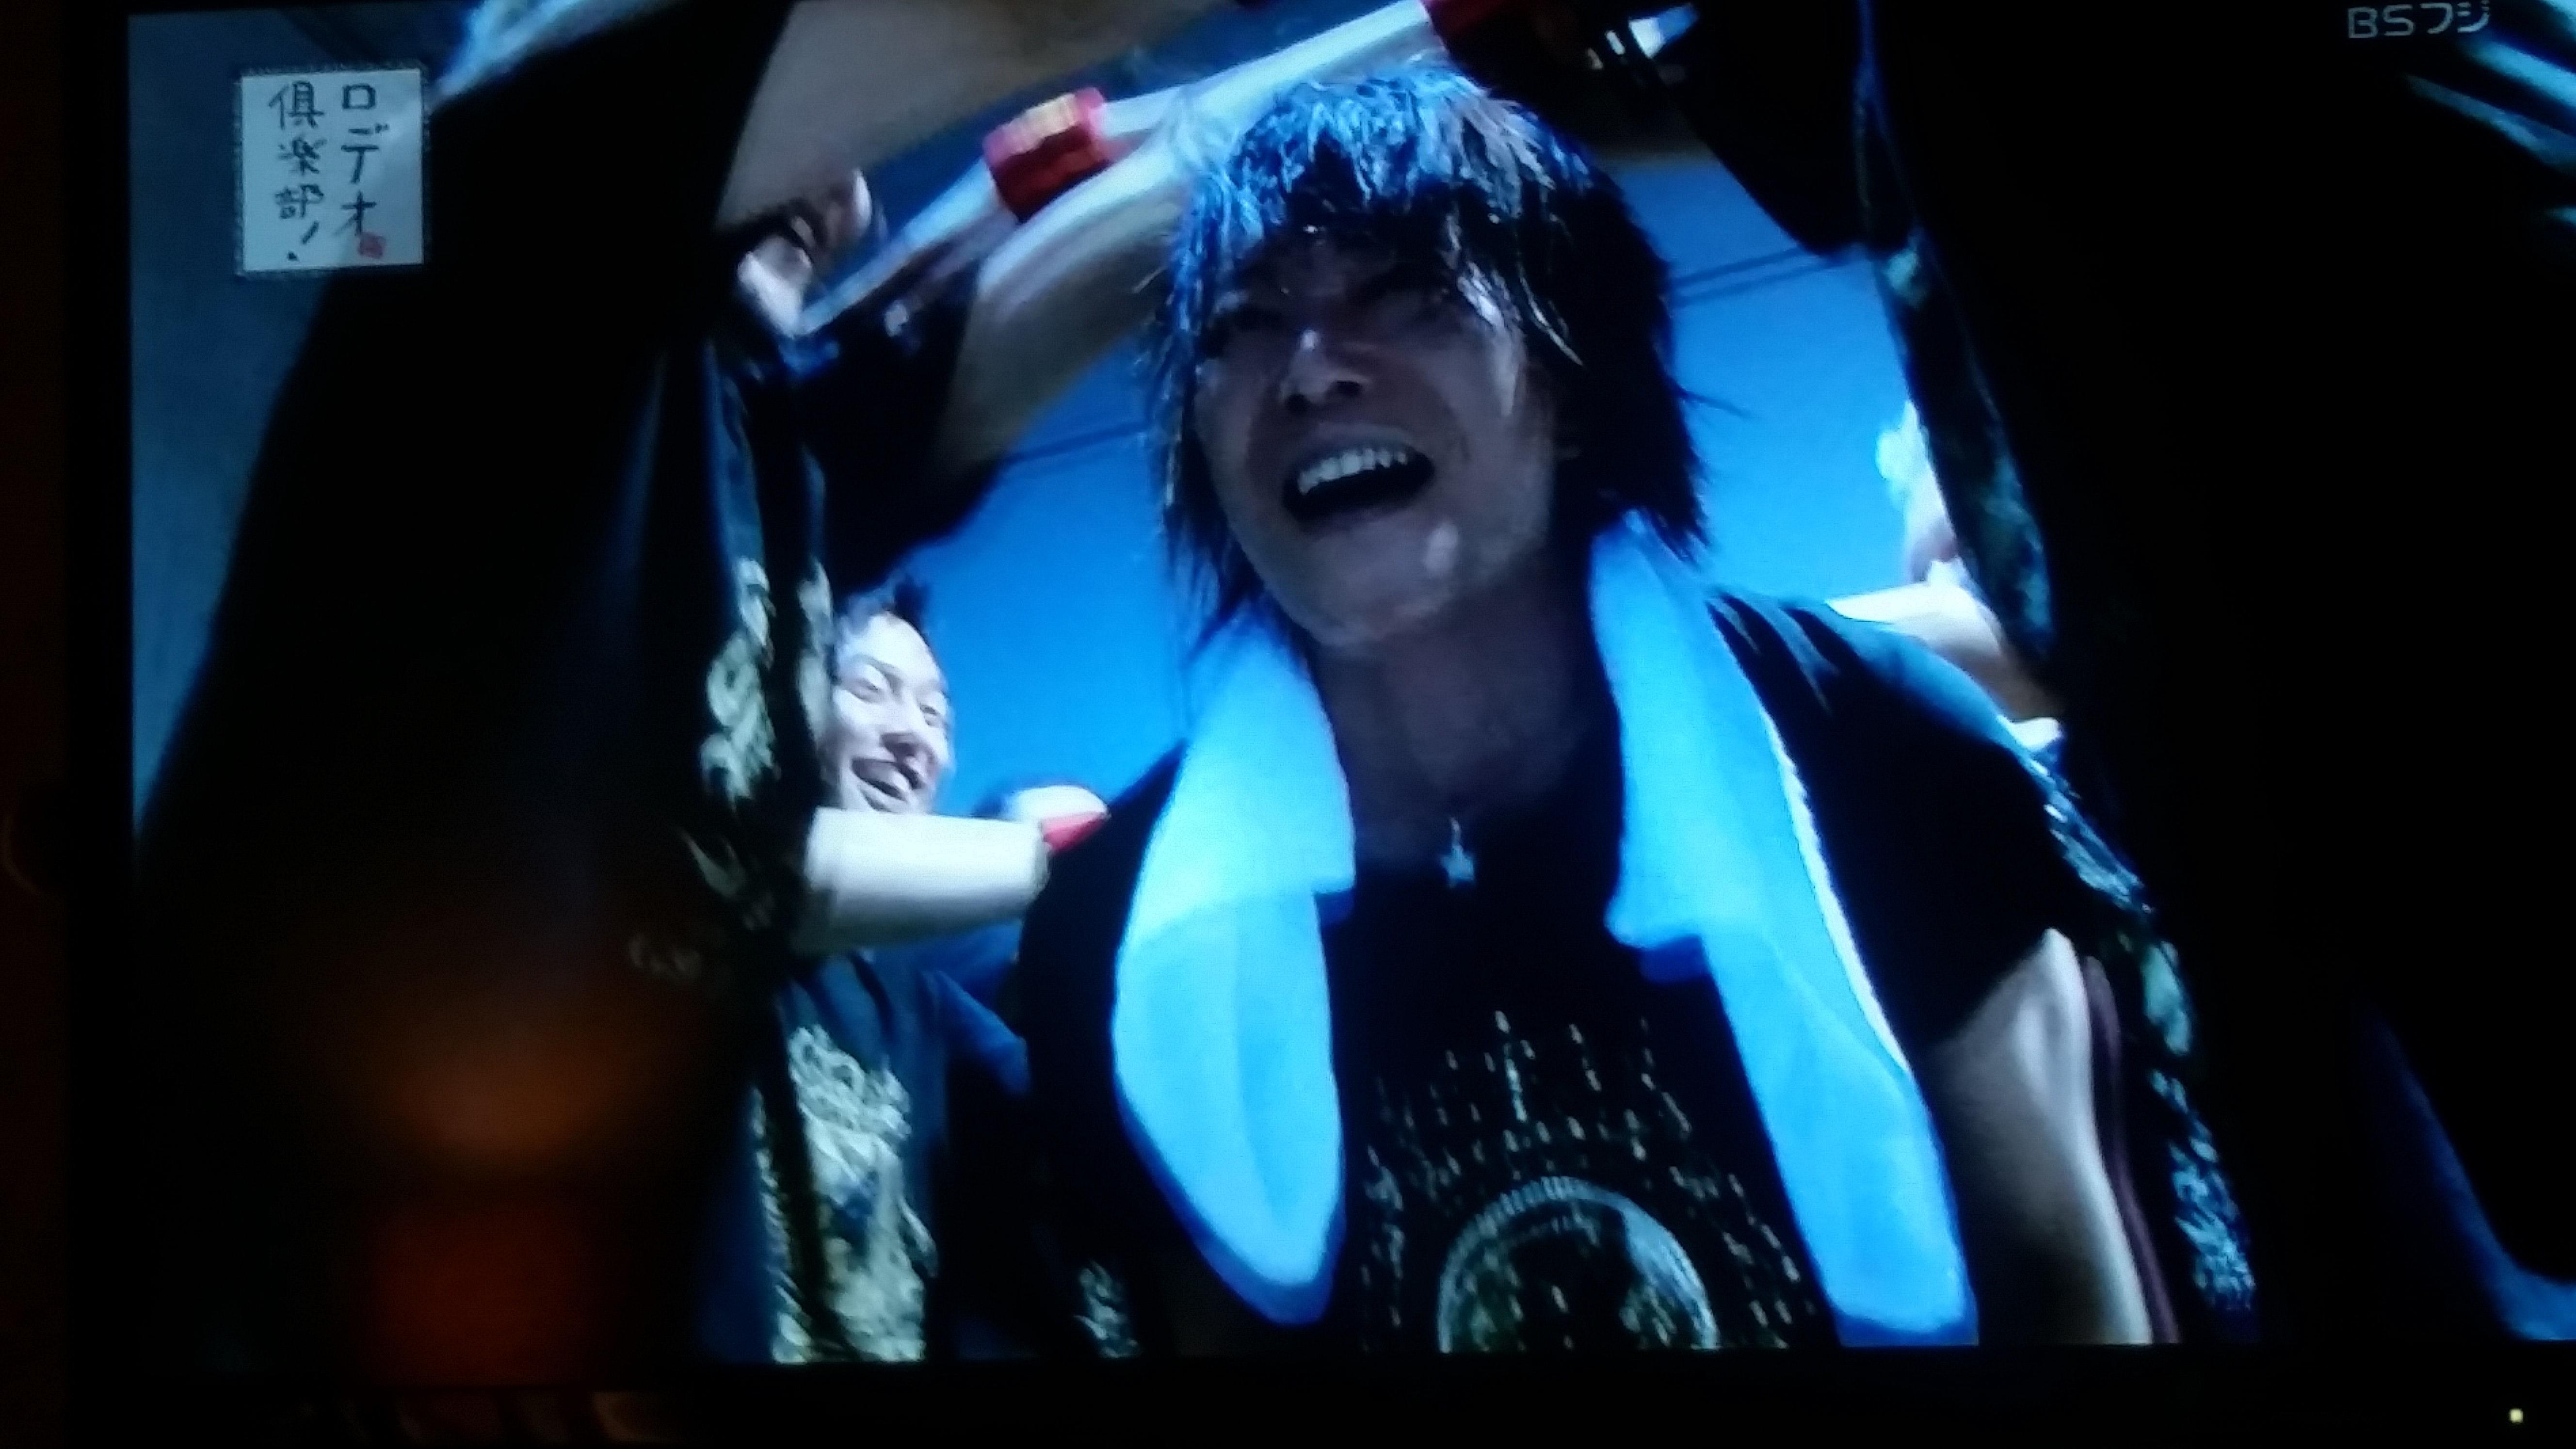 Rodeo Club (ロデオ倶楽部) カルマとラビリンス Special Screen Caps ...